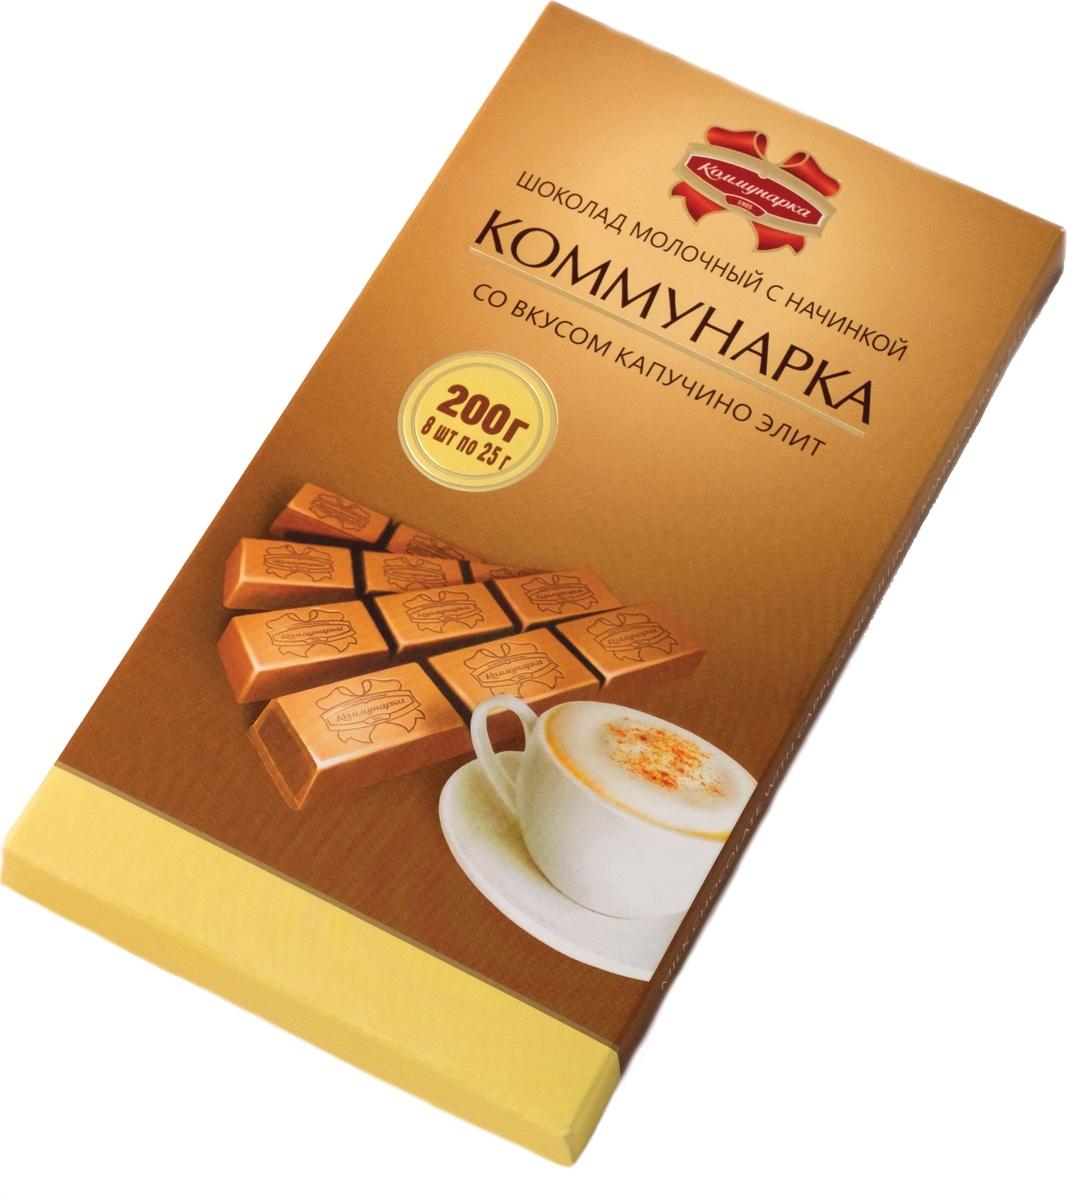 Коммунарка шоколад молочный со вкусом капучино элит, 200 г